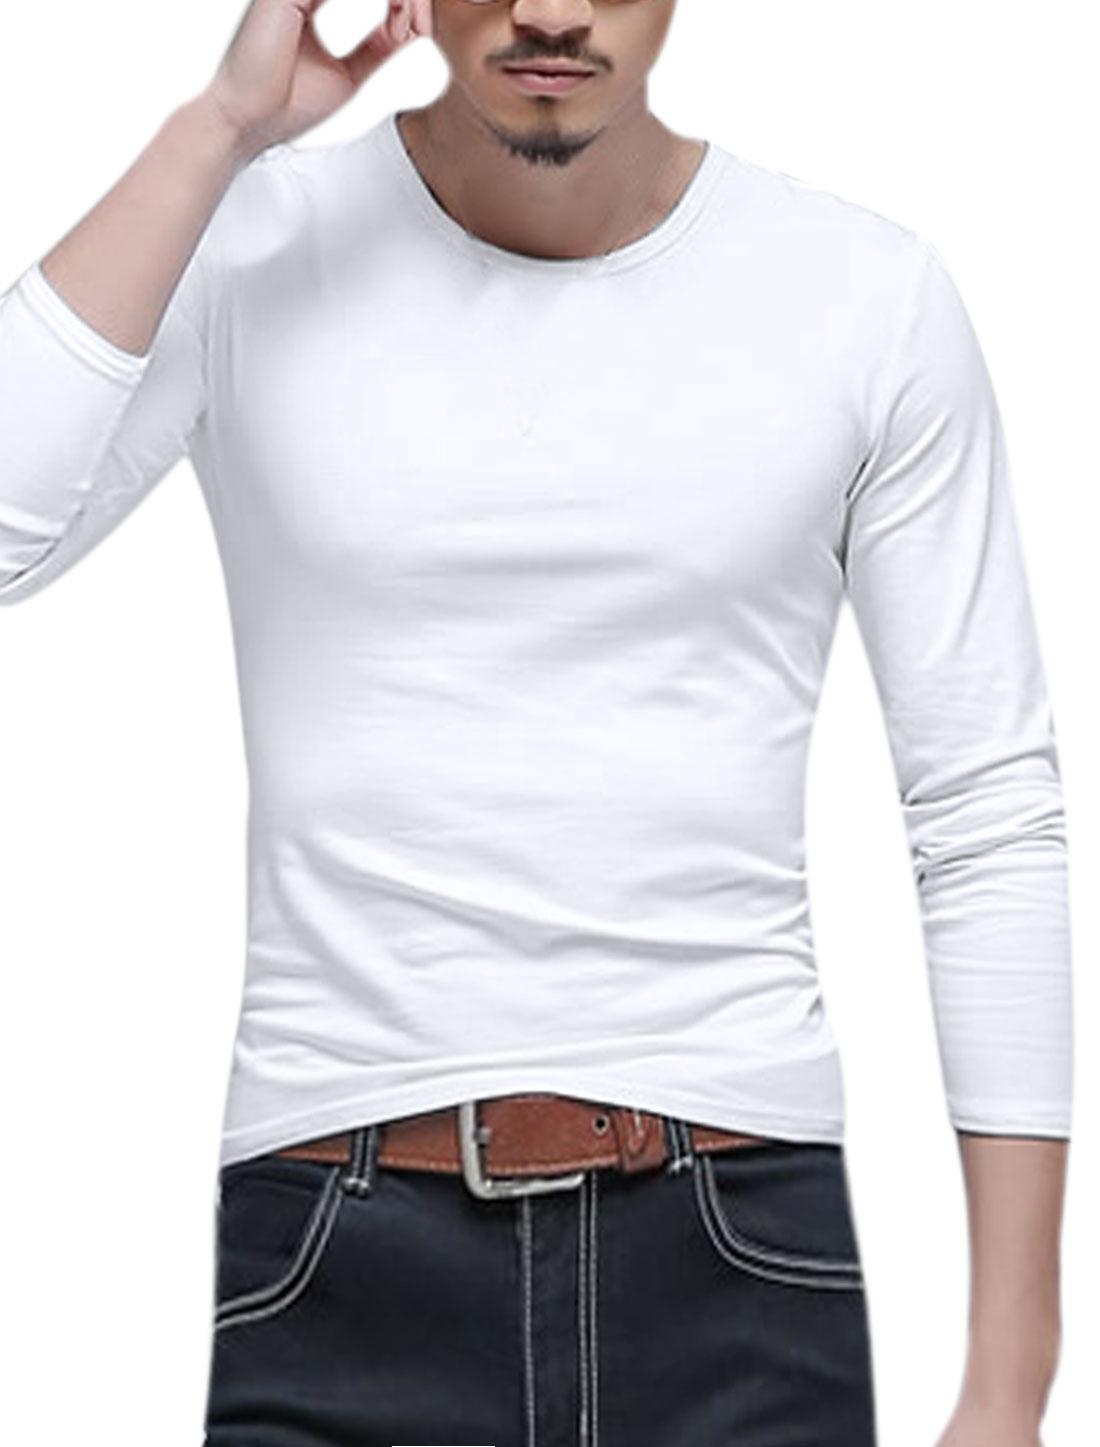 Men Long Sleeves Crew Neck Slim Fit Tee Shirt White M